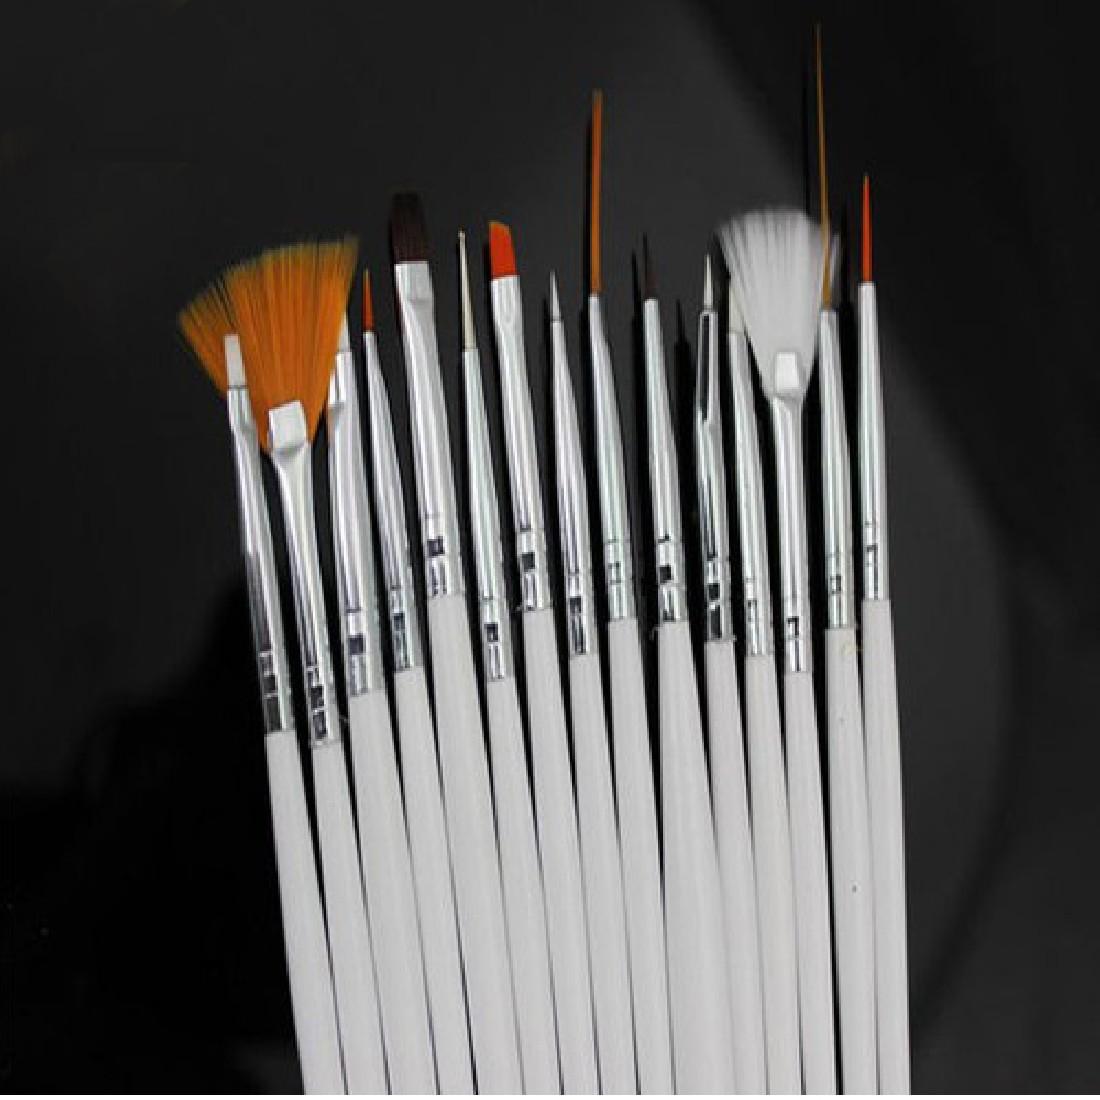 2016 high quality 15Pcs Nail Art Design Acrylic Dot Painting Tool Pen Polish Brush Set hot